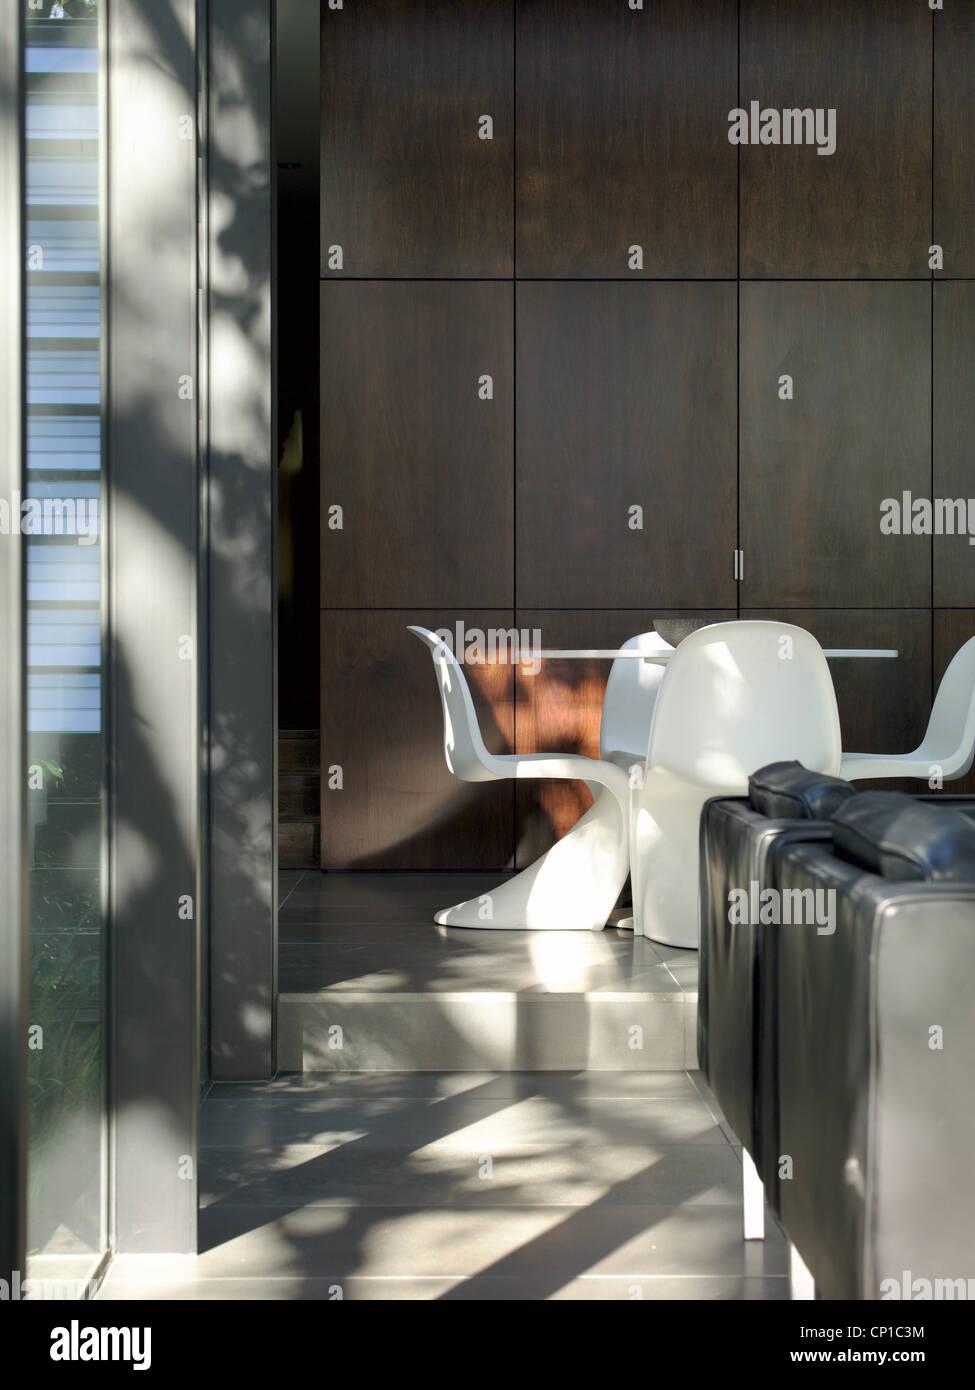 Eero Saarinen Table Stockfotos & Eero Saarinen Table Bilder - Alamy